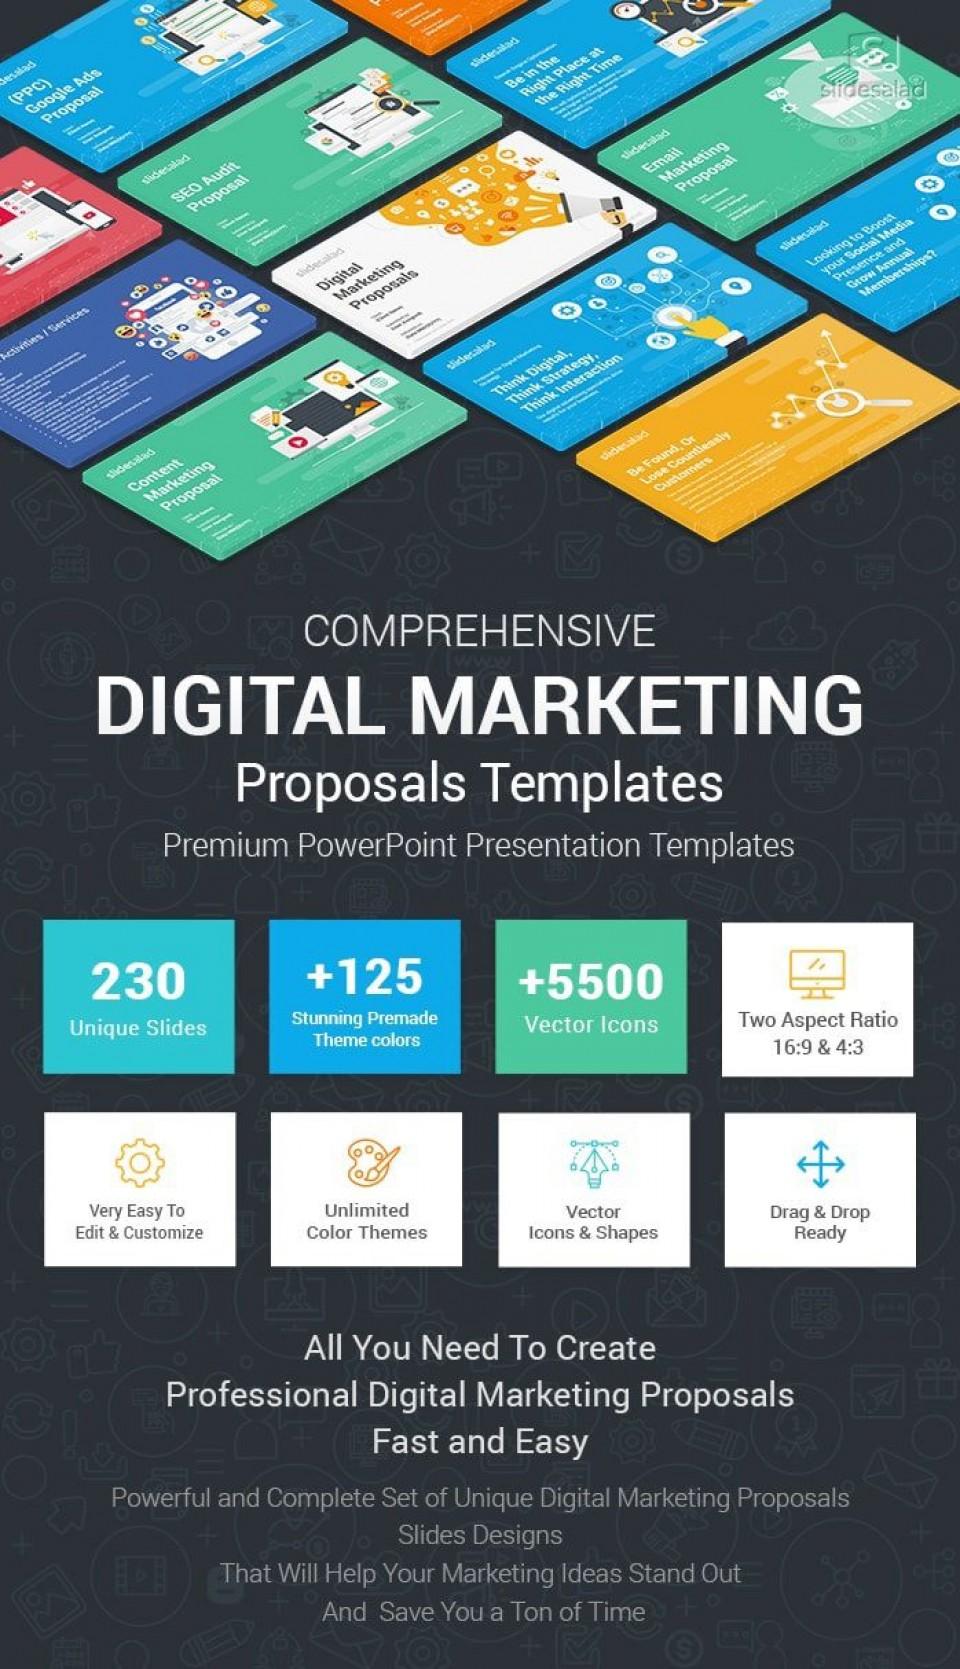 003 Breathtaking Social Media Proposal Template Ppt Inspiration 960